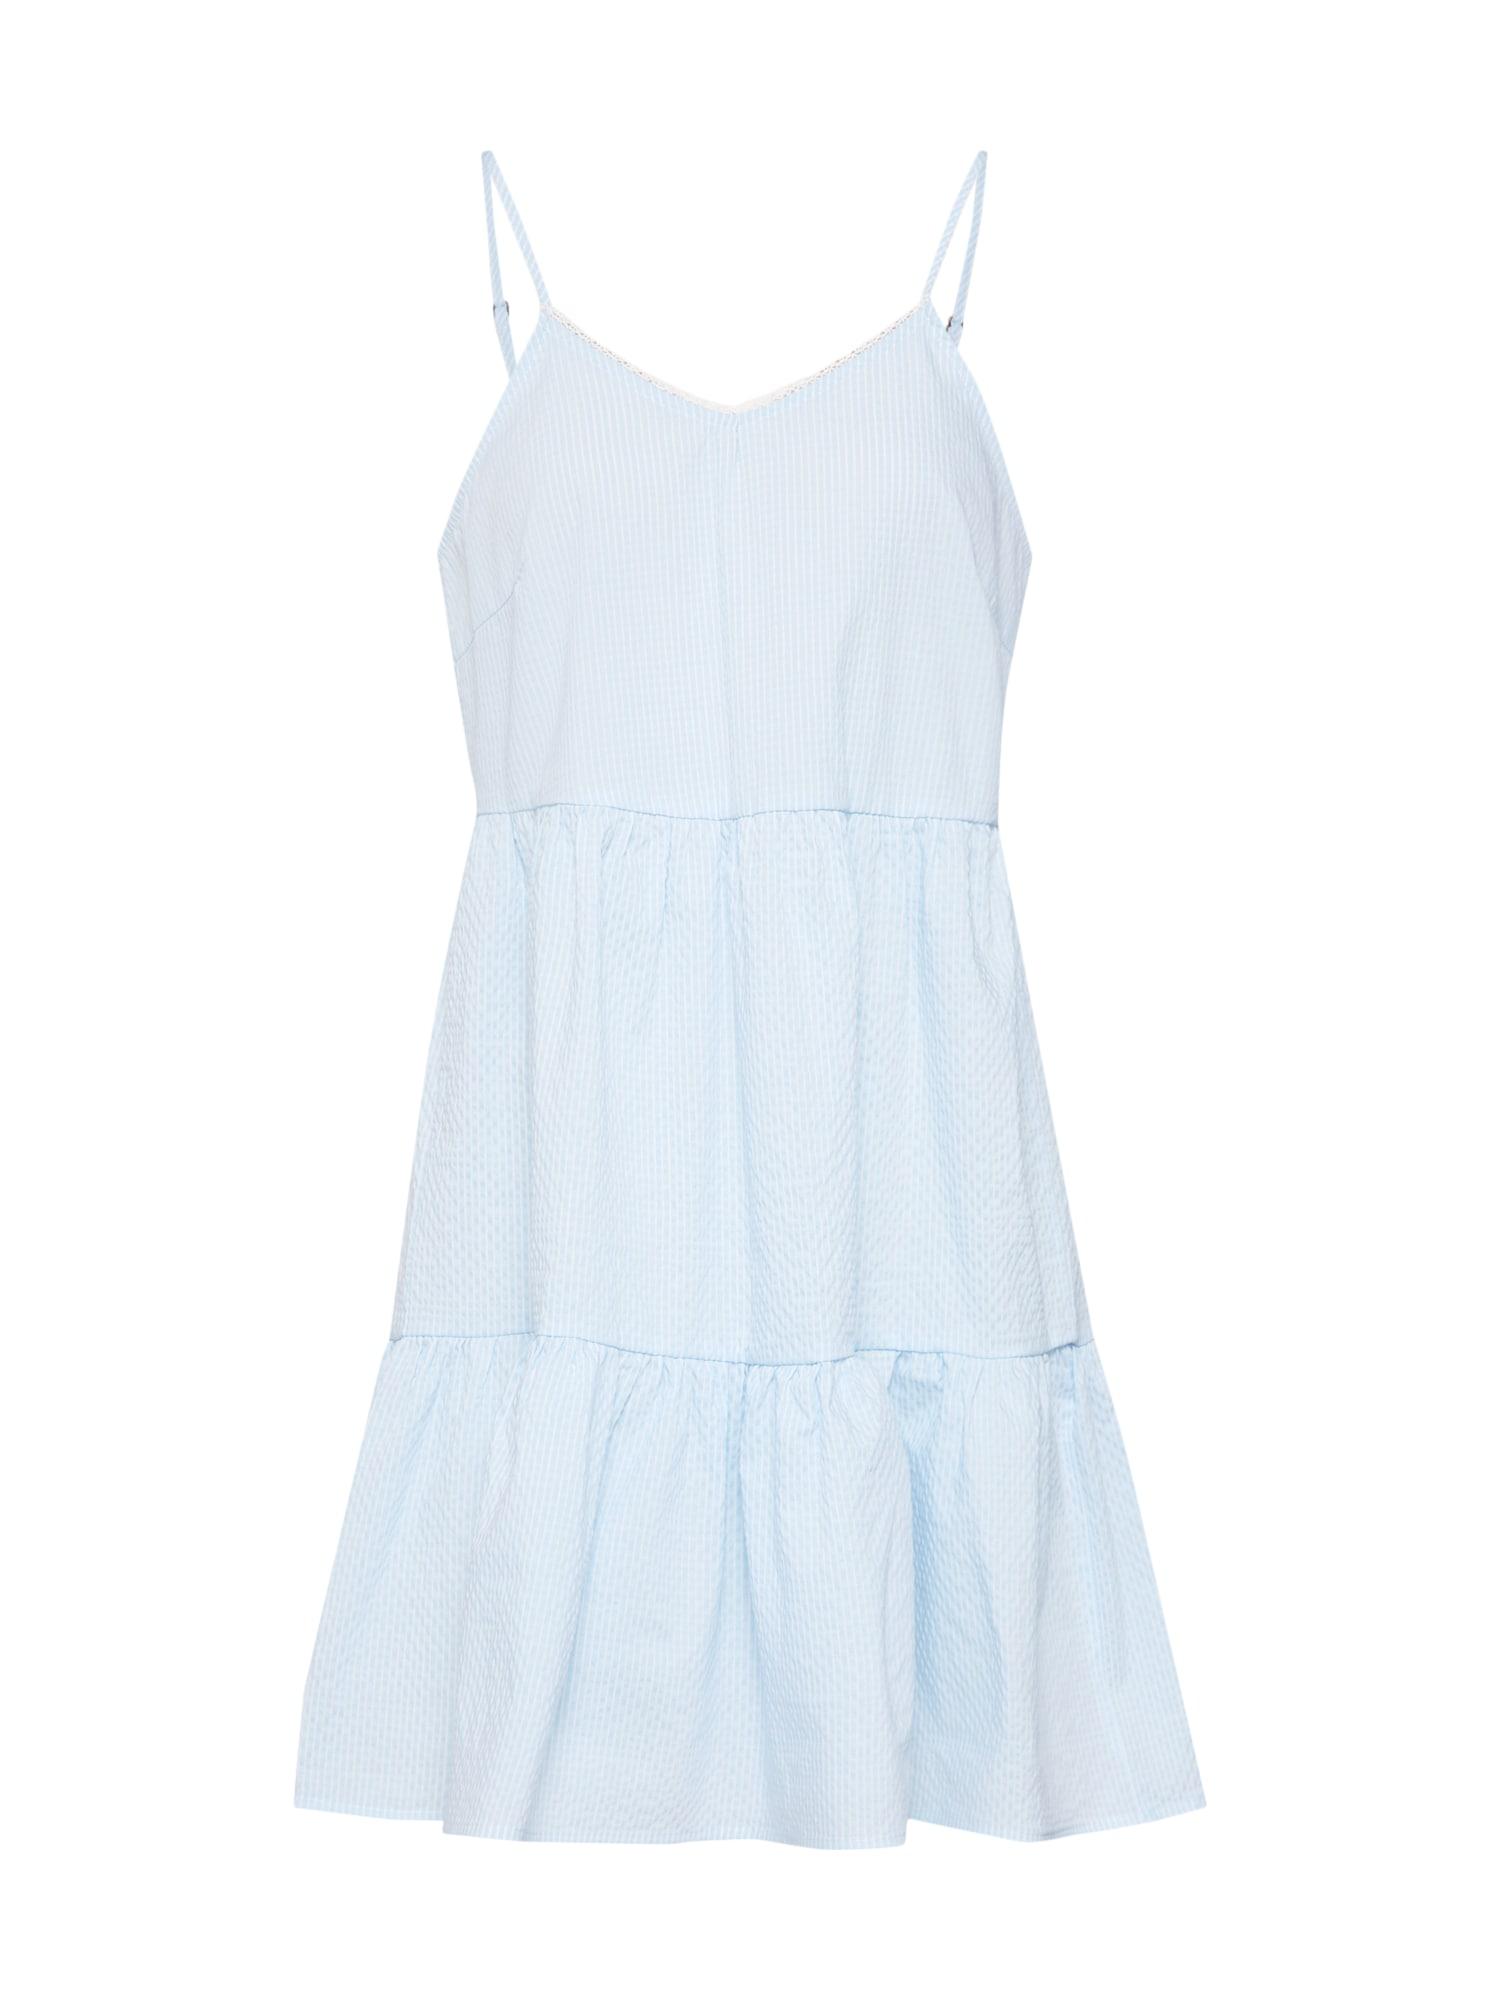 Letní šaty VMJANE ABK SINGLET DRESS modrá bílá VERO MODA